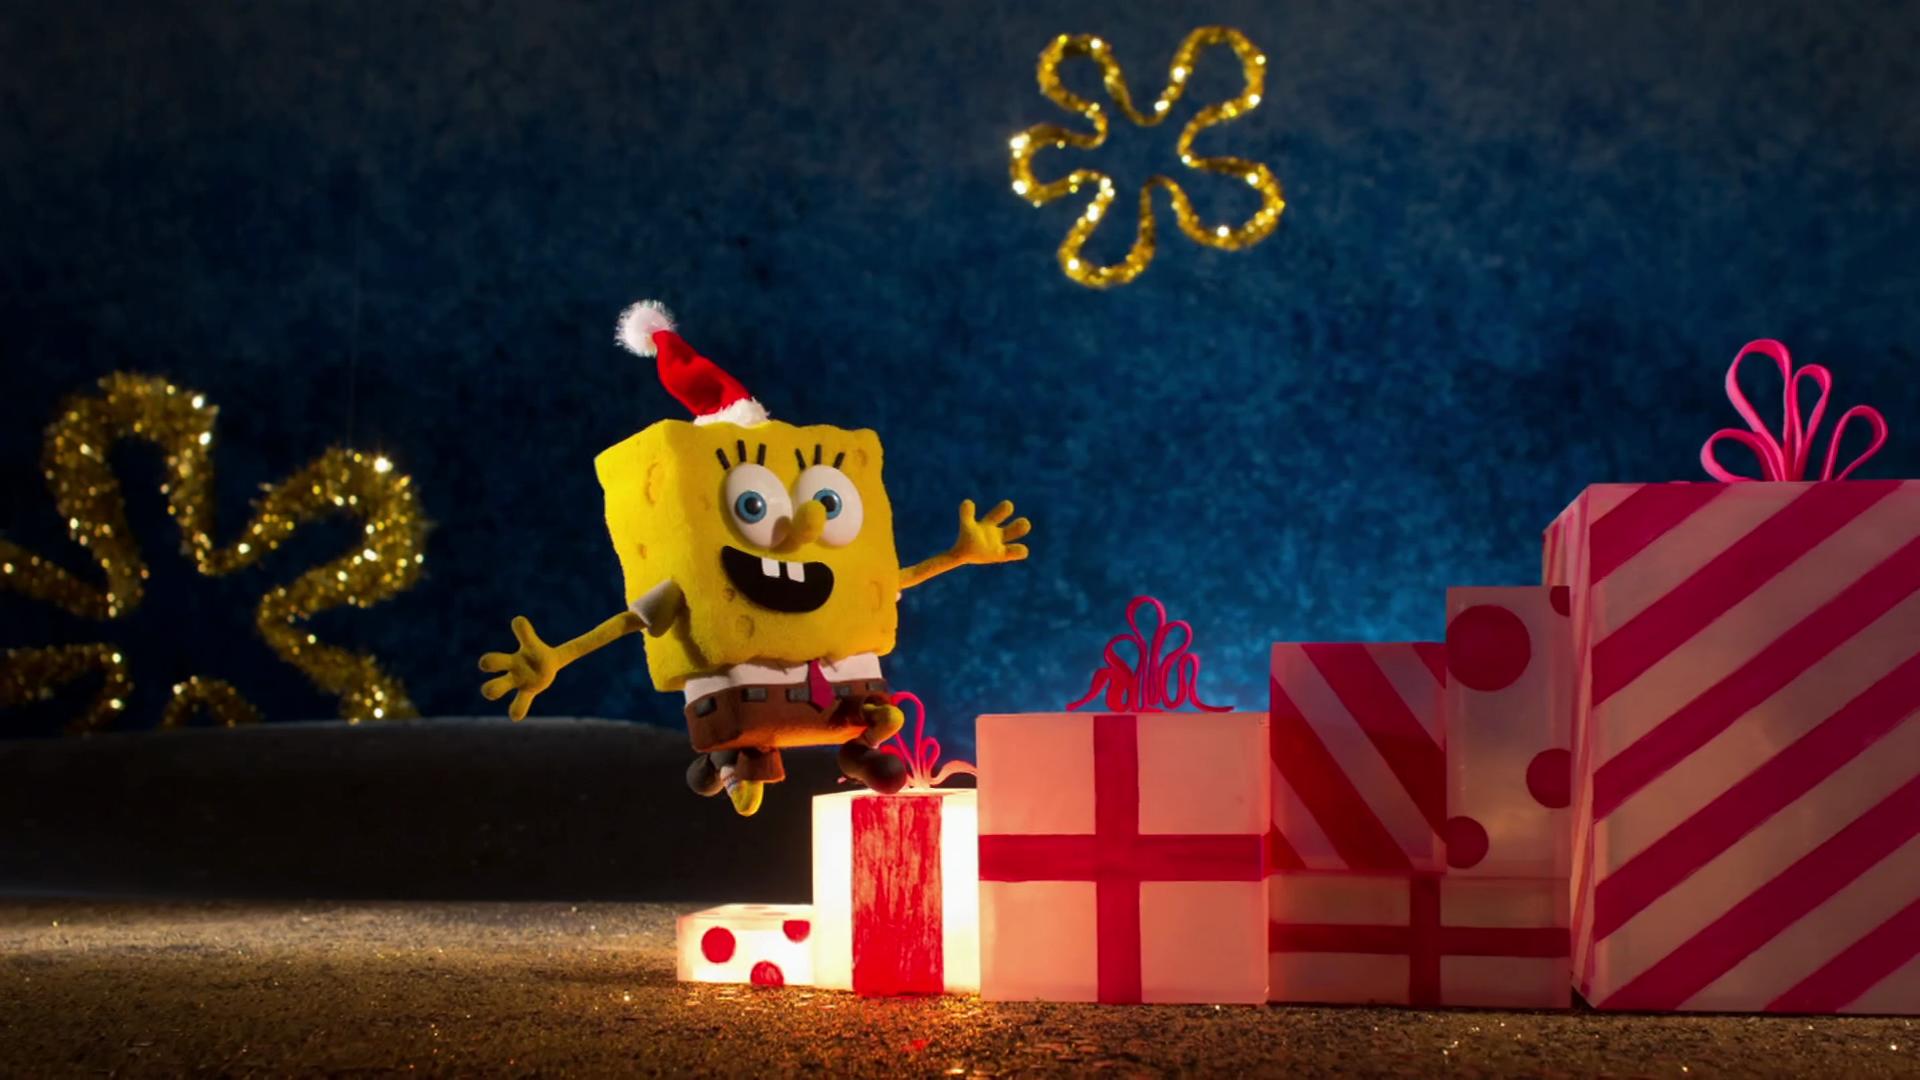 Spongebob christmas song lyrics